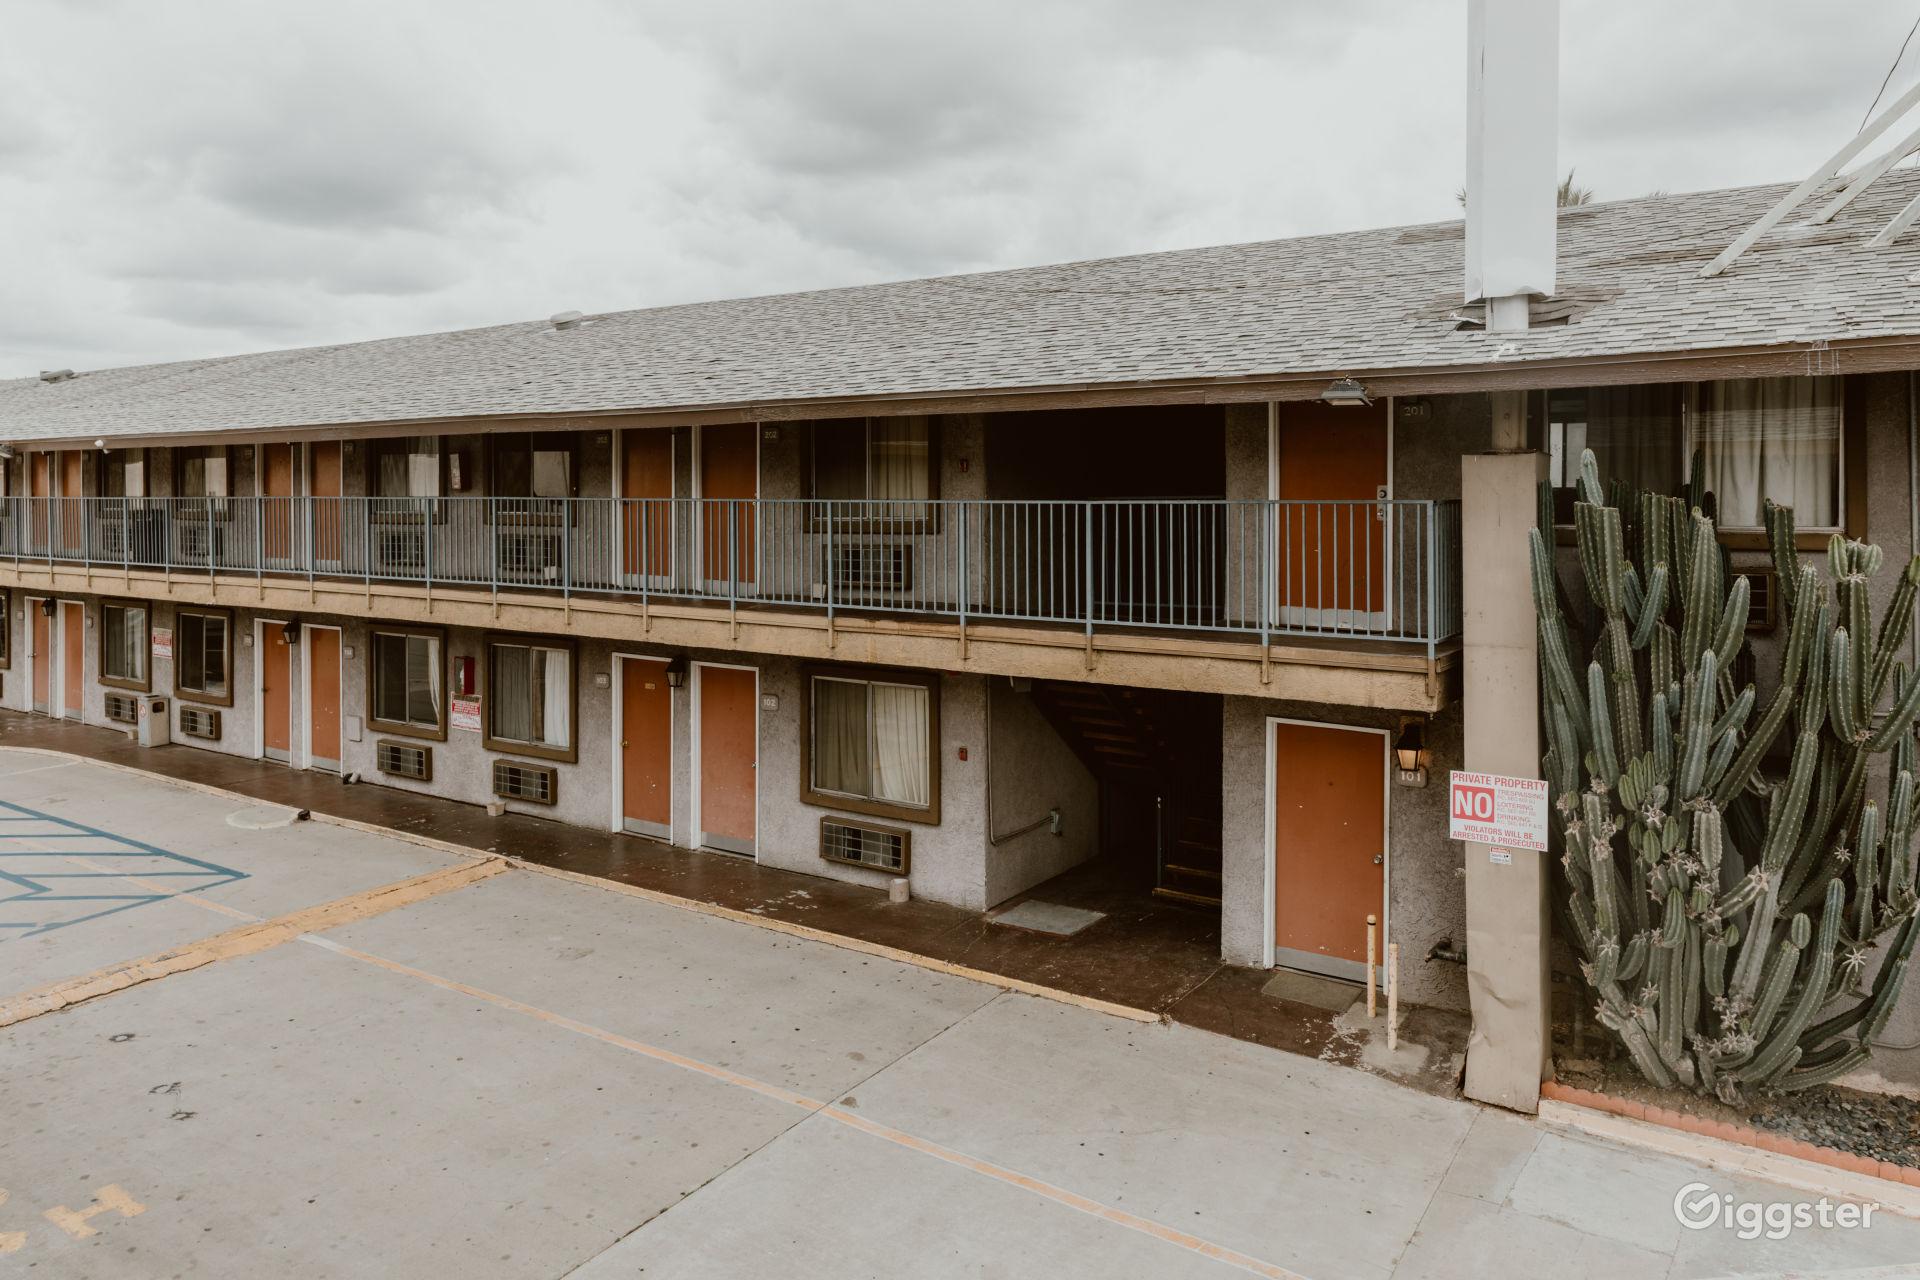 The Seedy Motel near San Fernando Los Angeles Rental